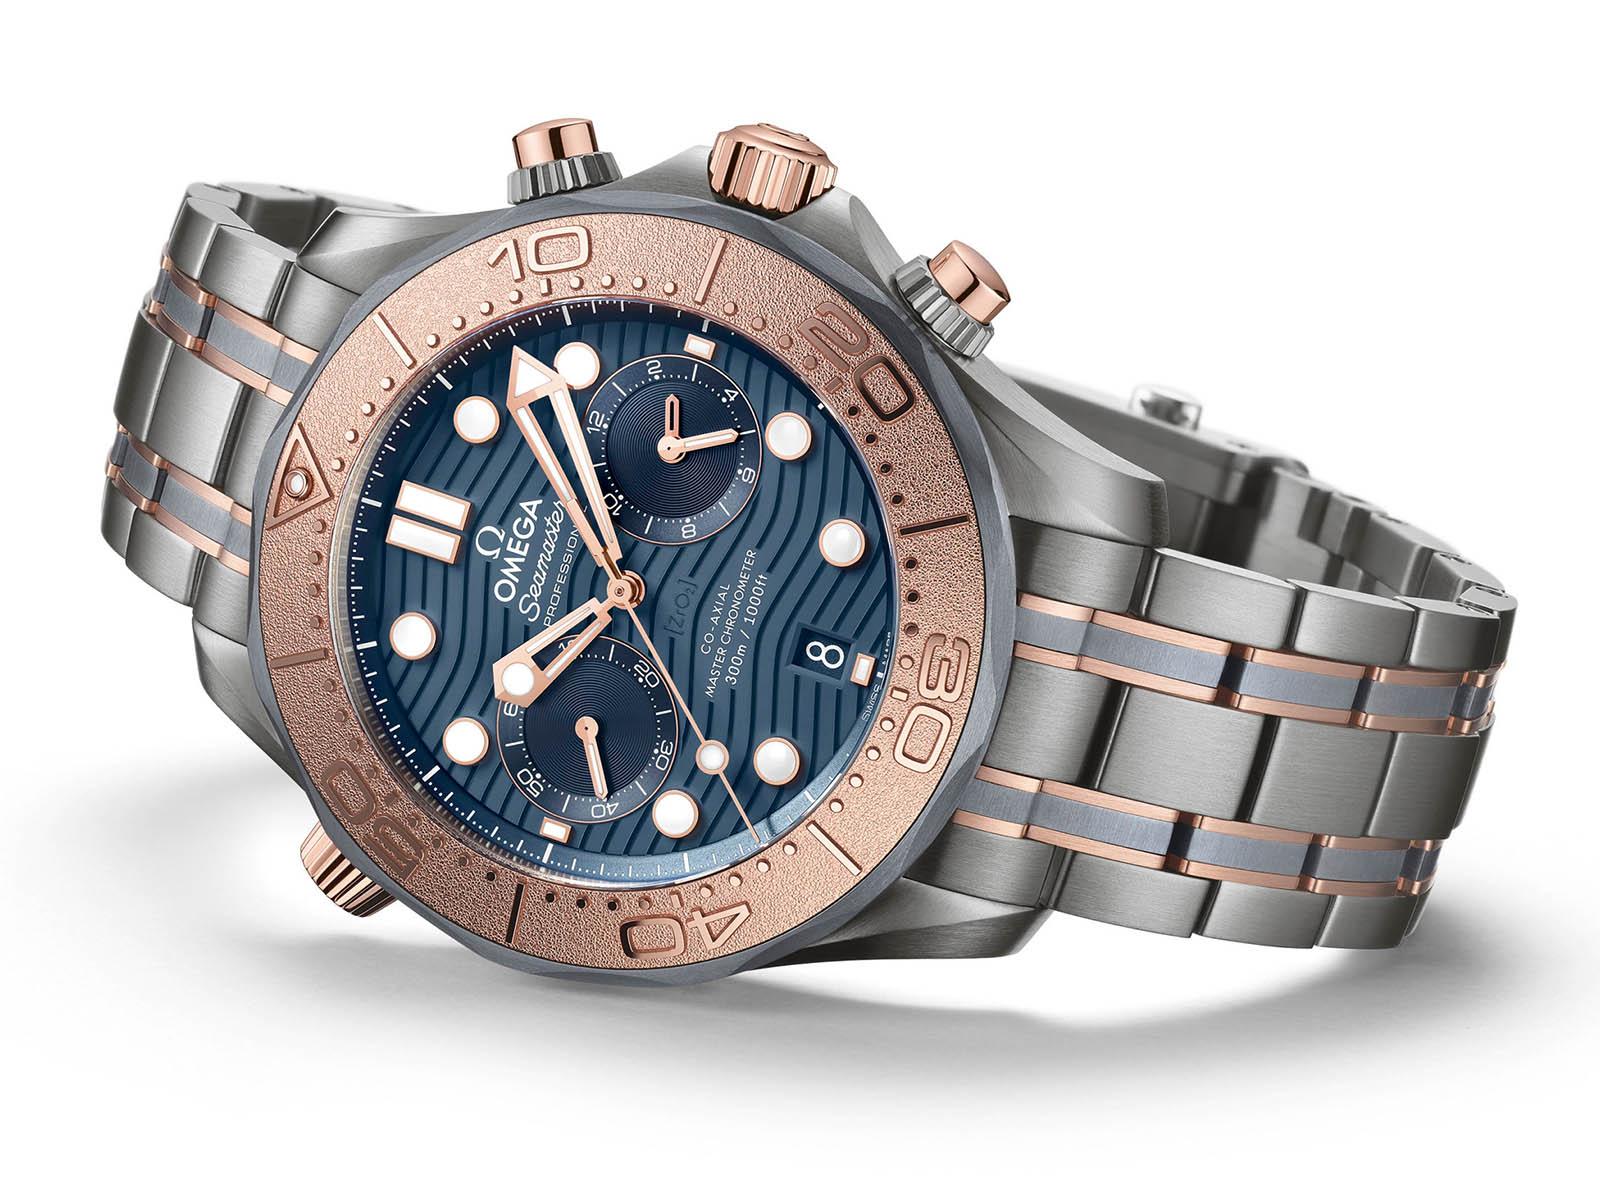 omega-seamaster-diver-300m-chronograph-gold-titanium-tantalum-5.jpg